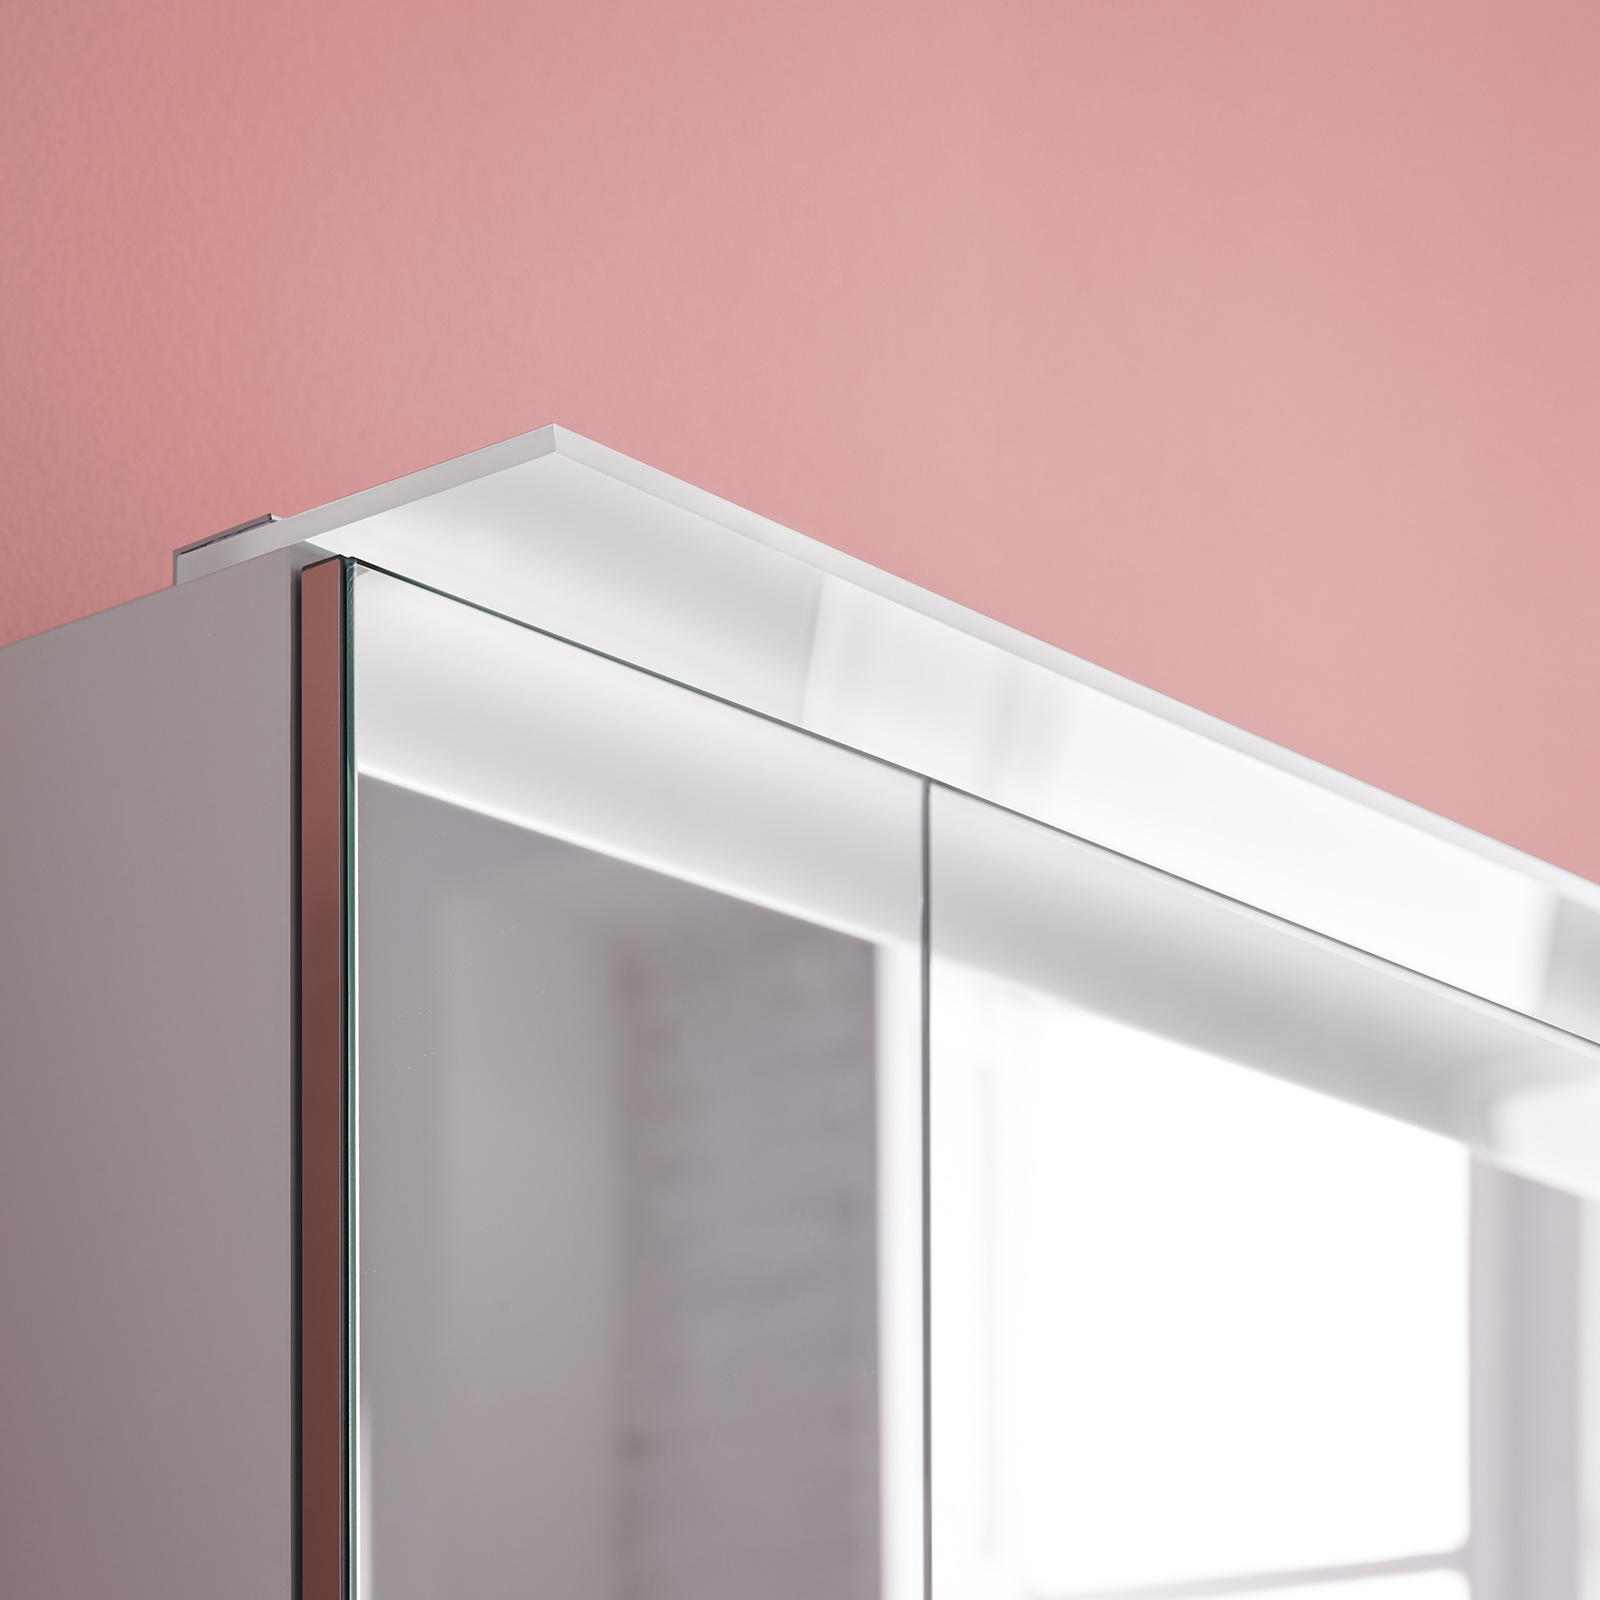 Utenpåliggende LED-møbelbelysning Adele 100cm bred